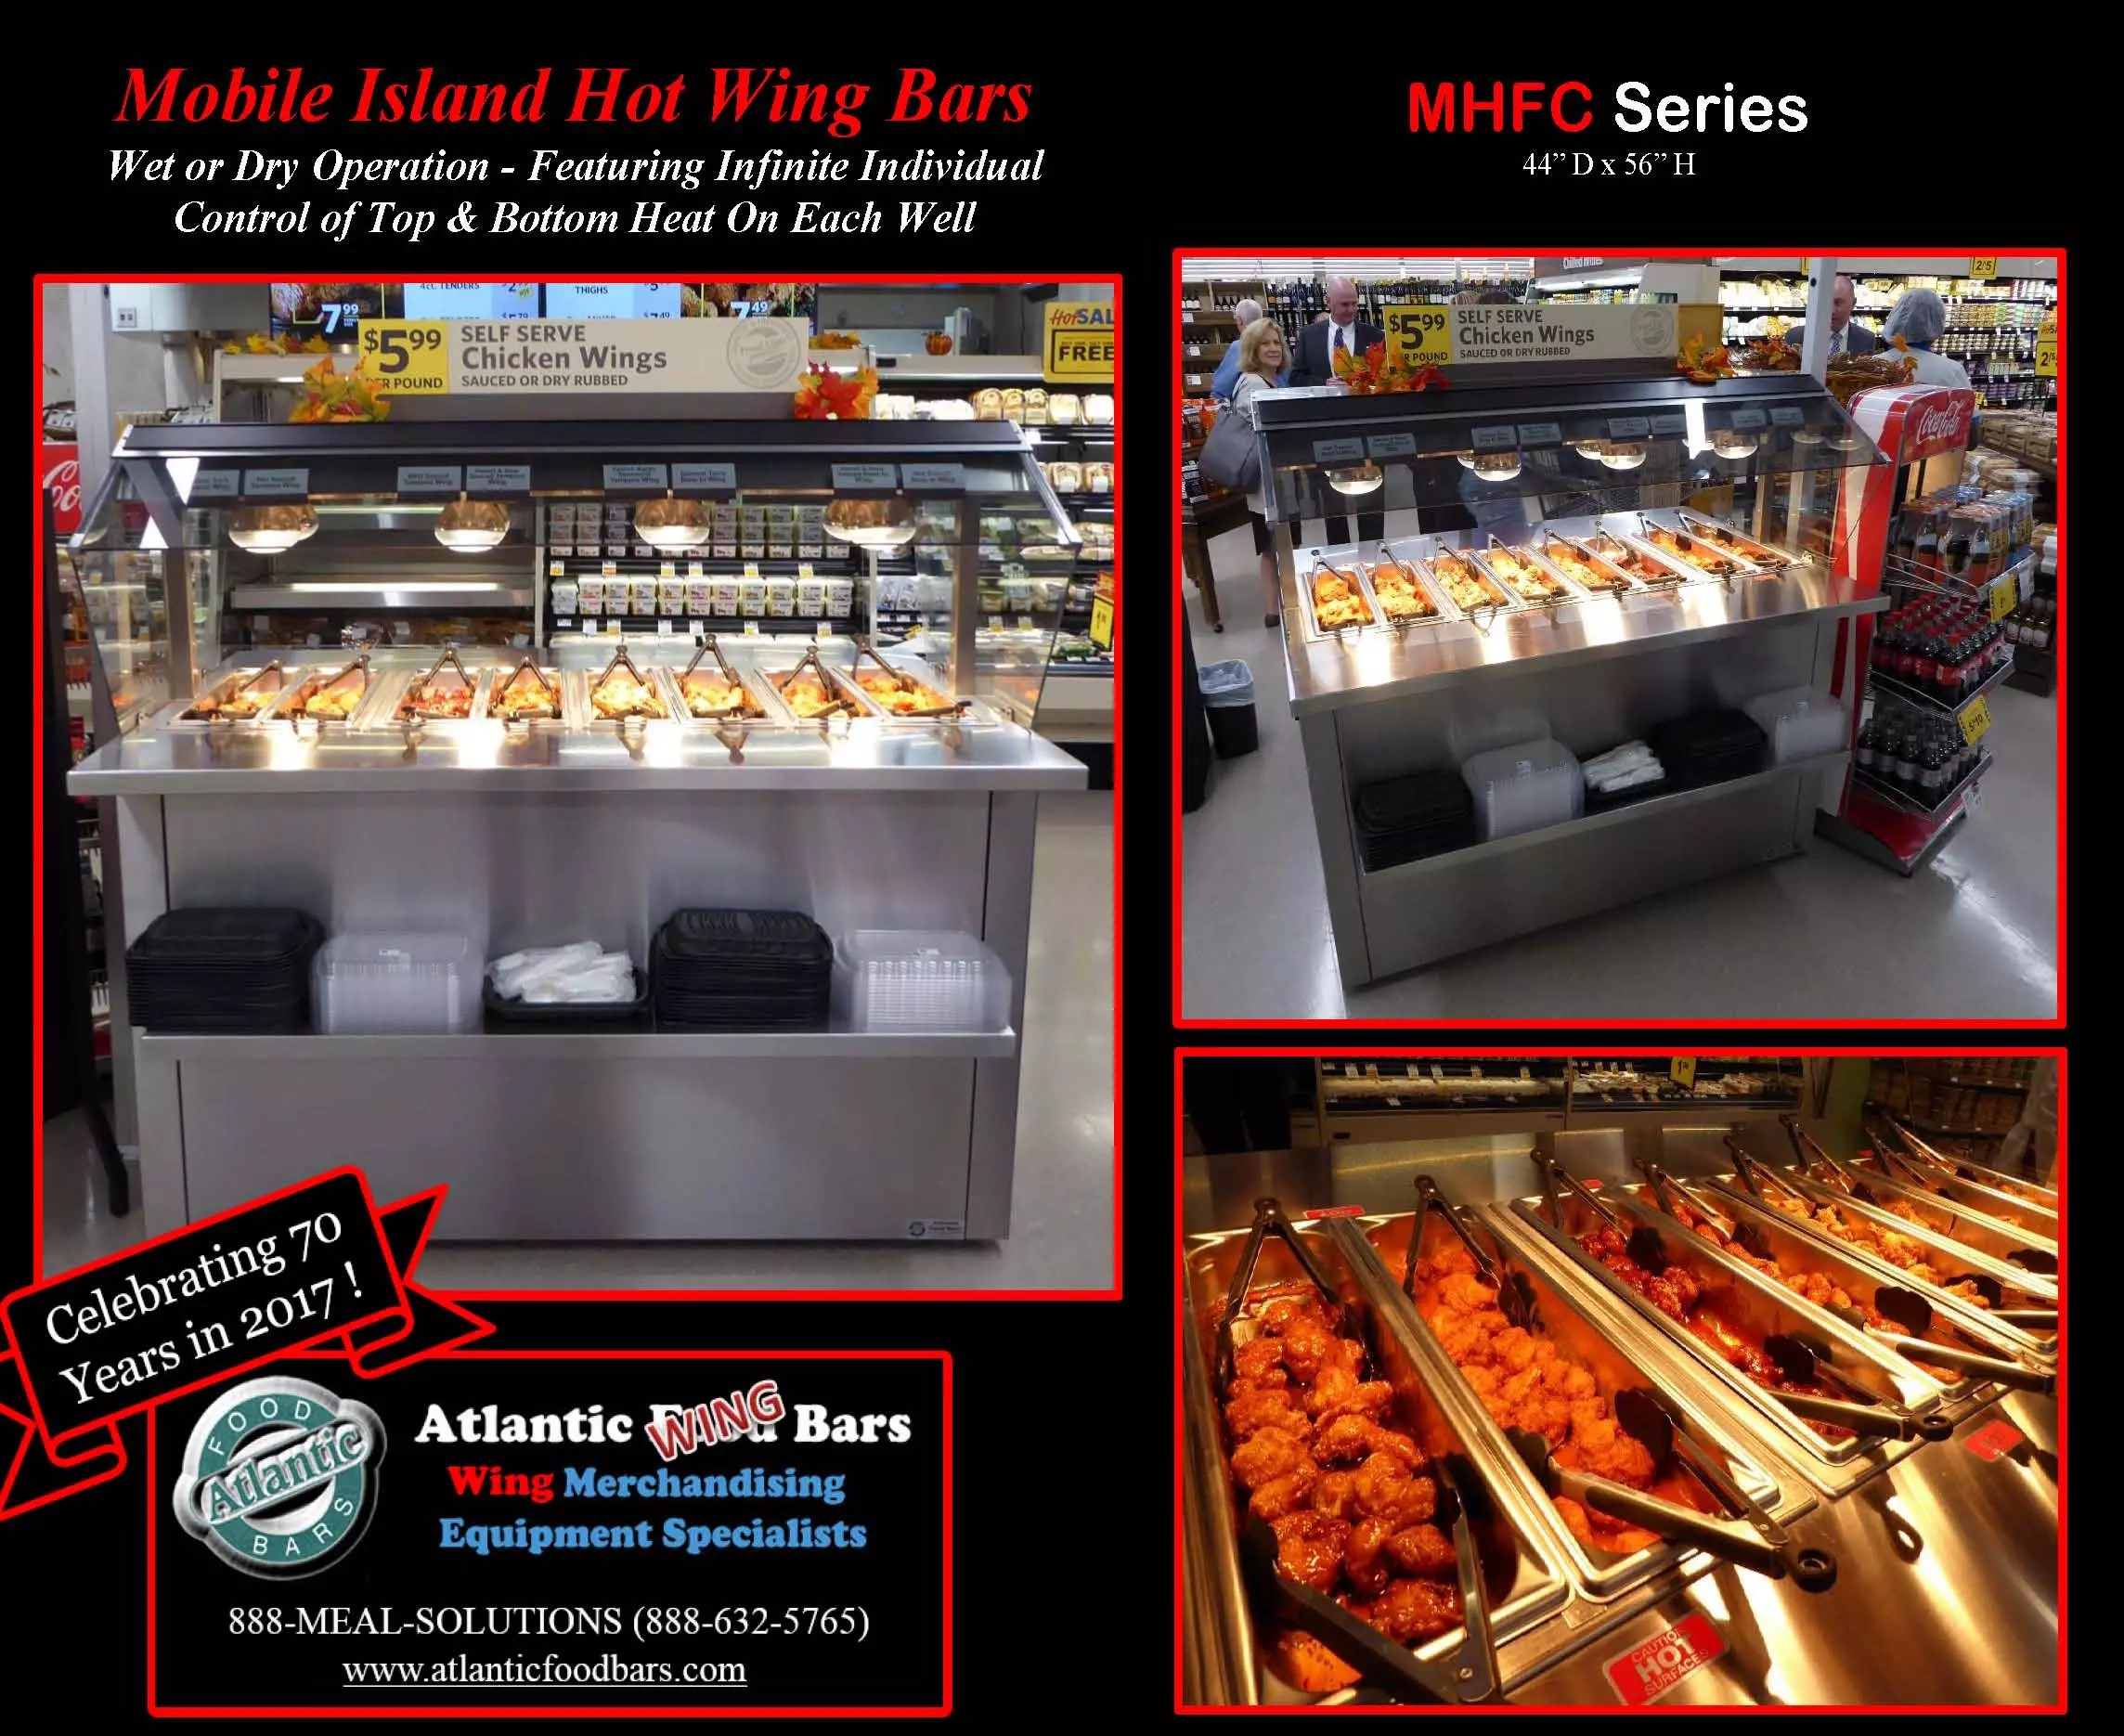 Atlantic Food Bars - Mobile Hot Wing Bars - MHFC_Page_1